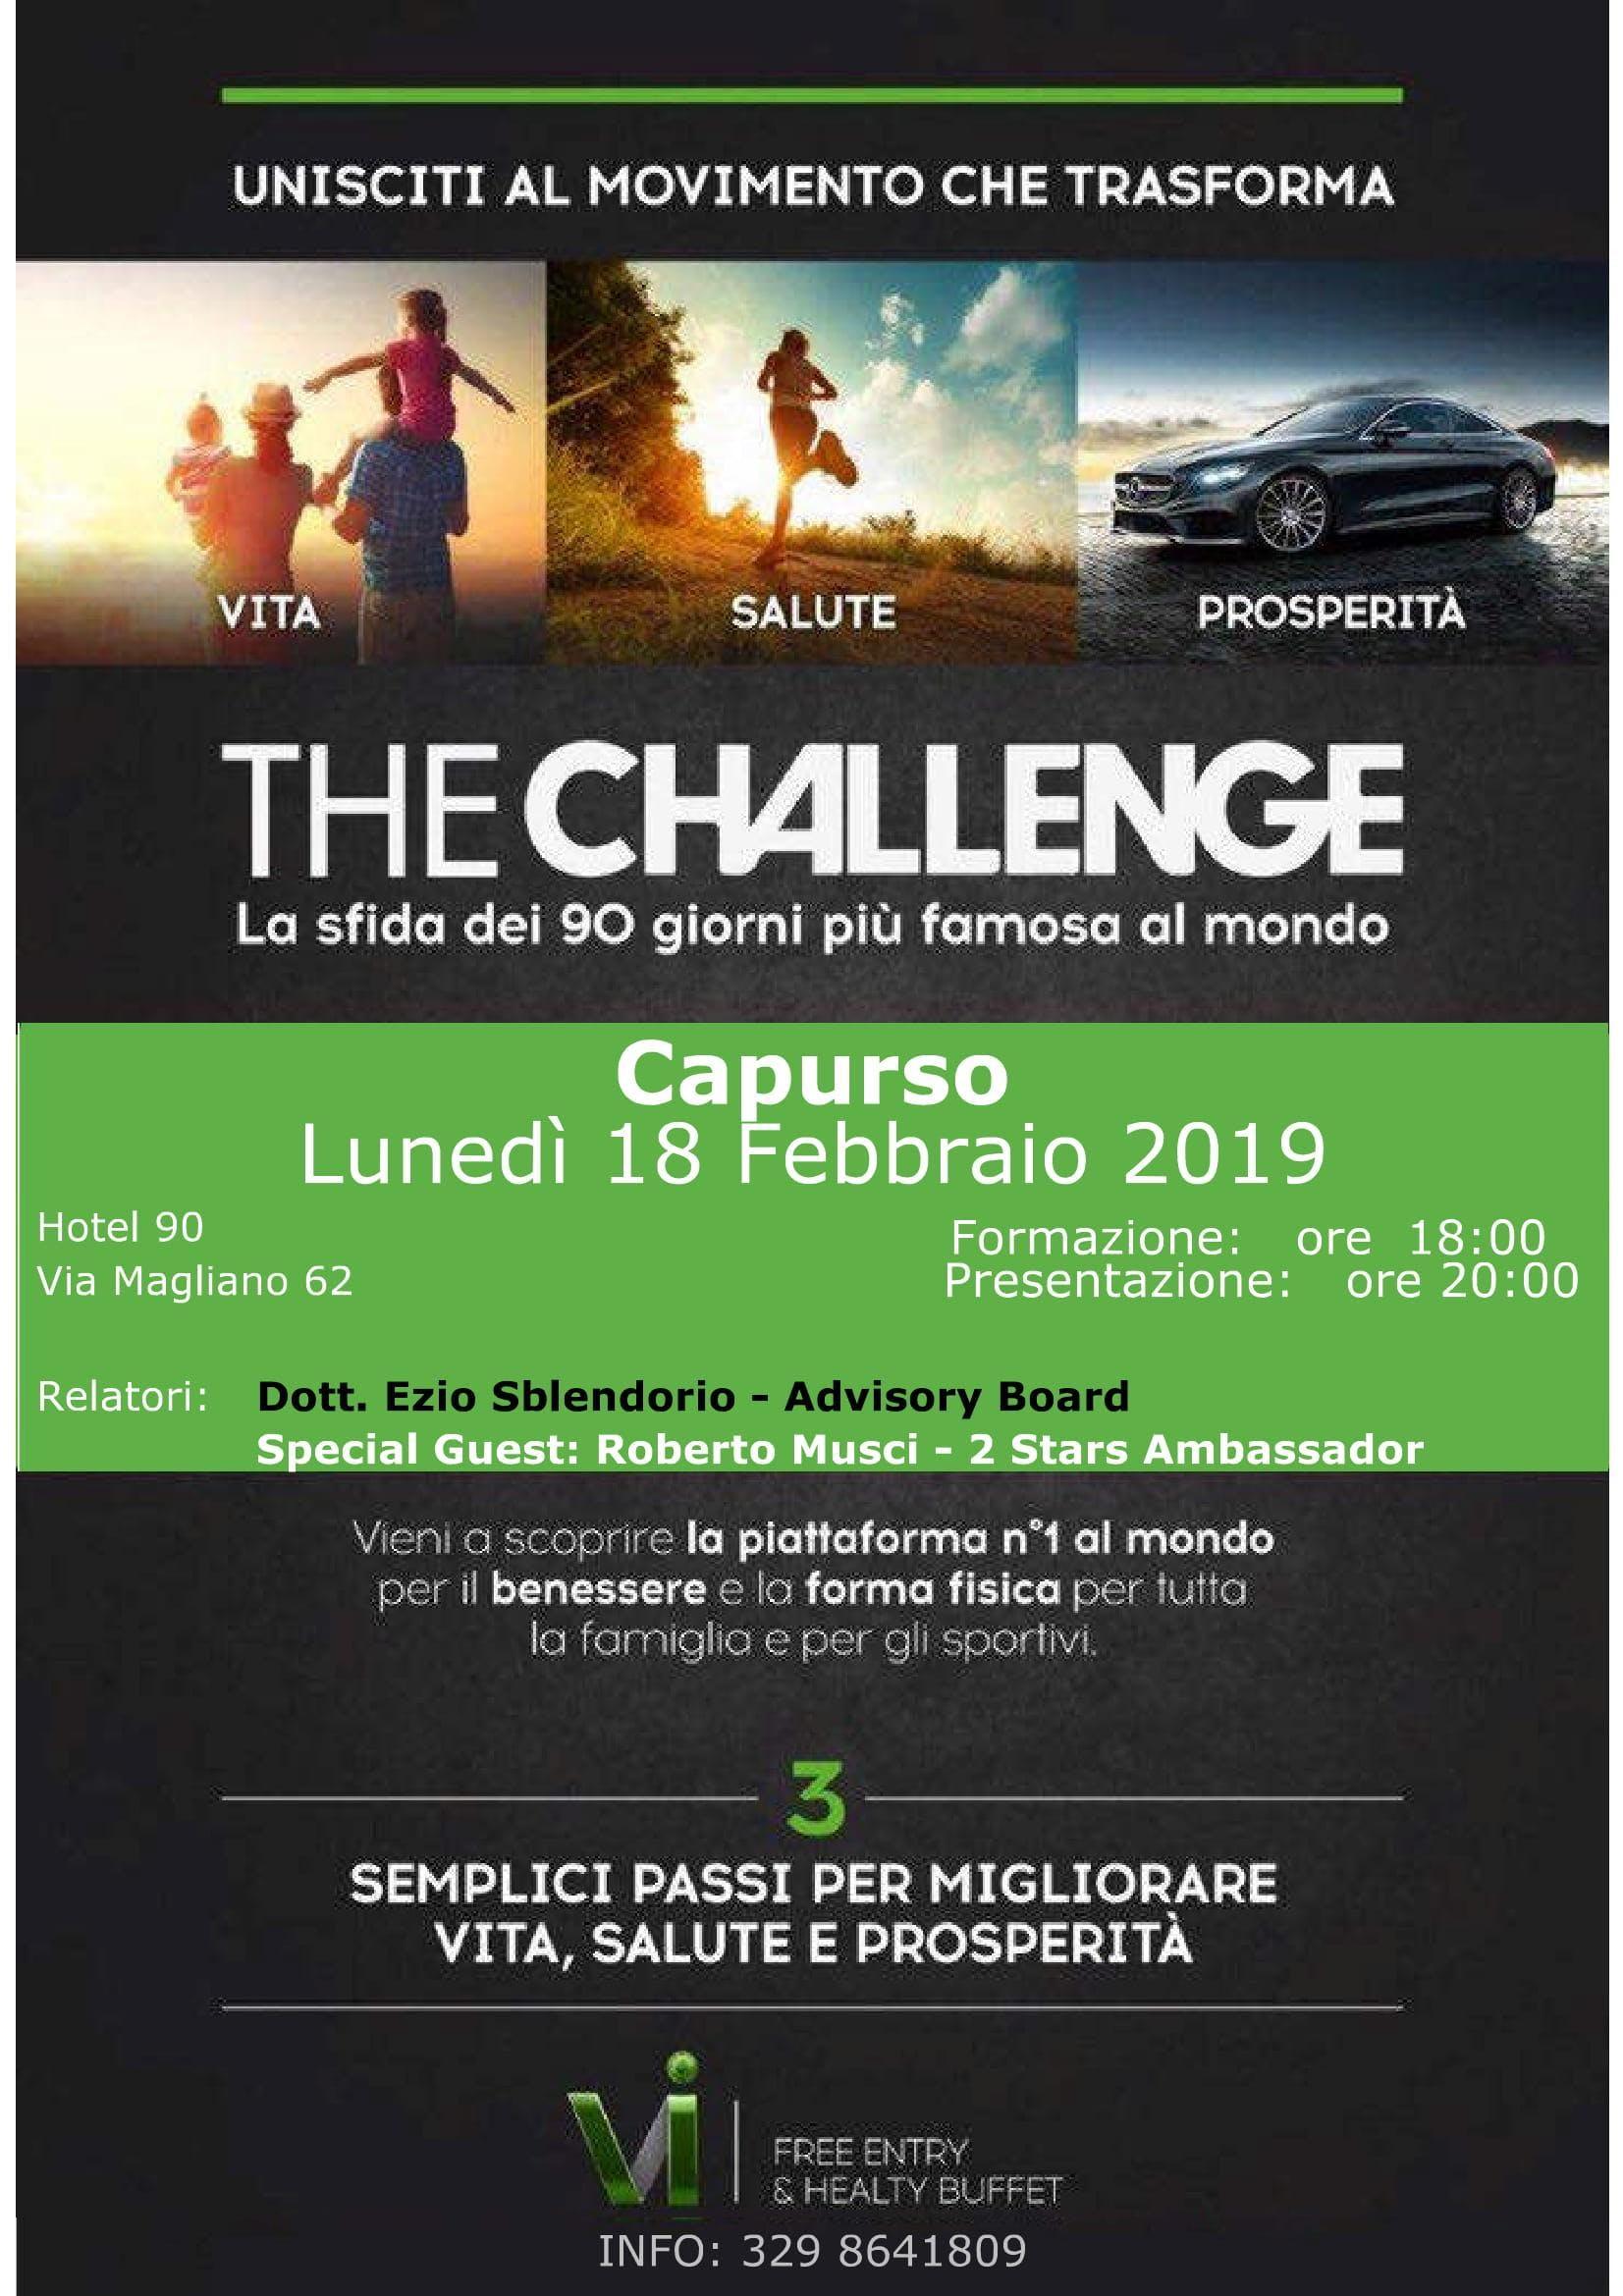 THE CHALLENGE - Capurso